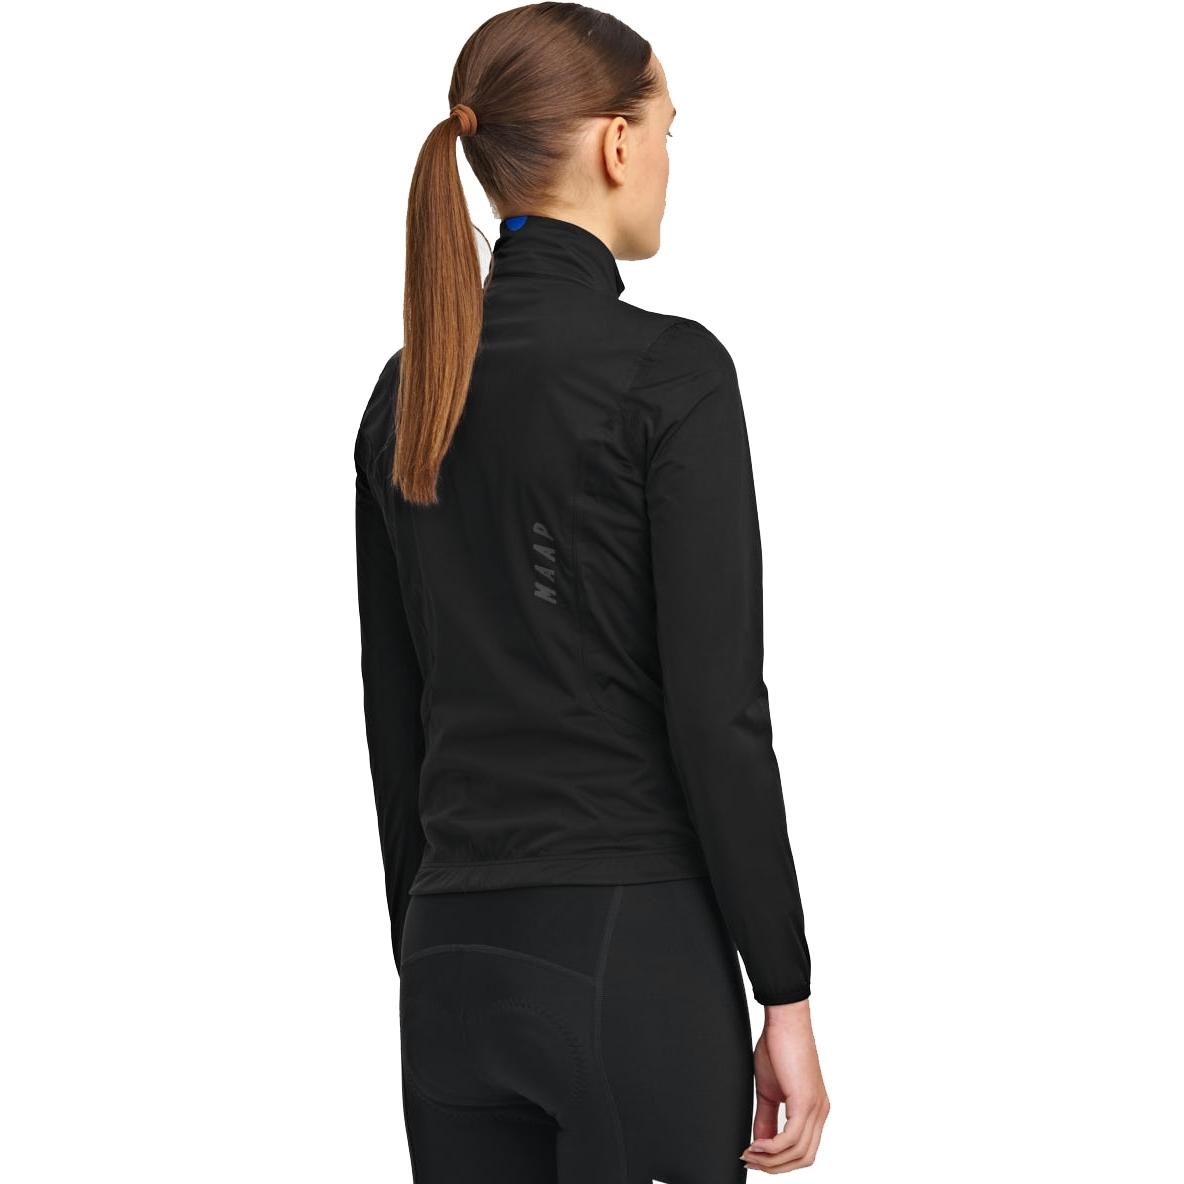 Image of MAAP Women's Unite Team Rain Jacket - black